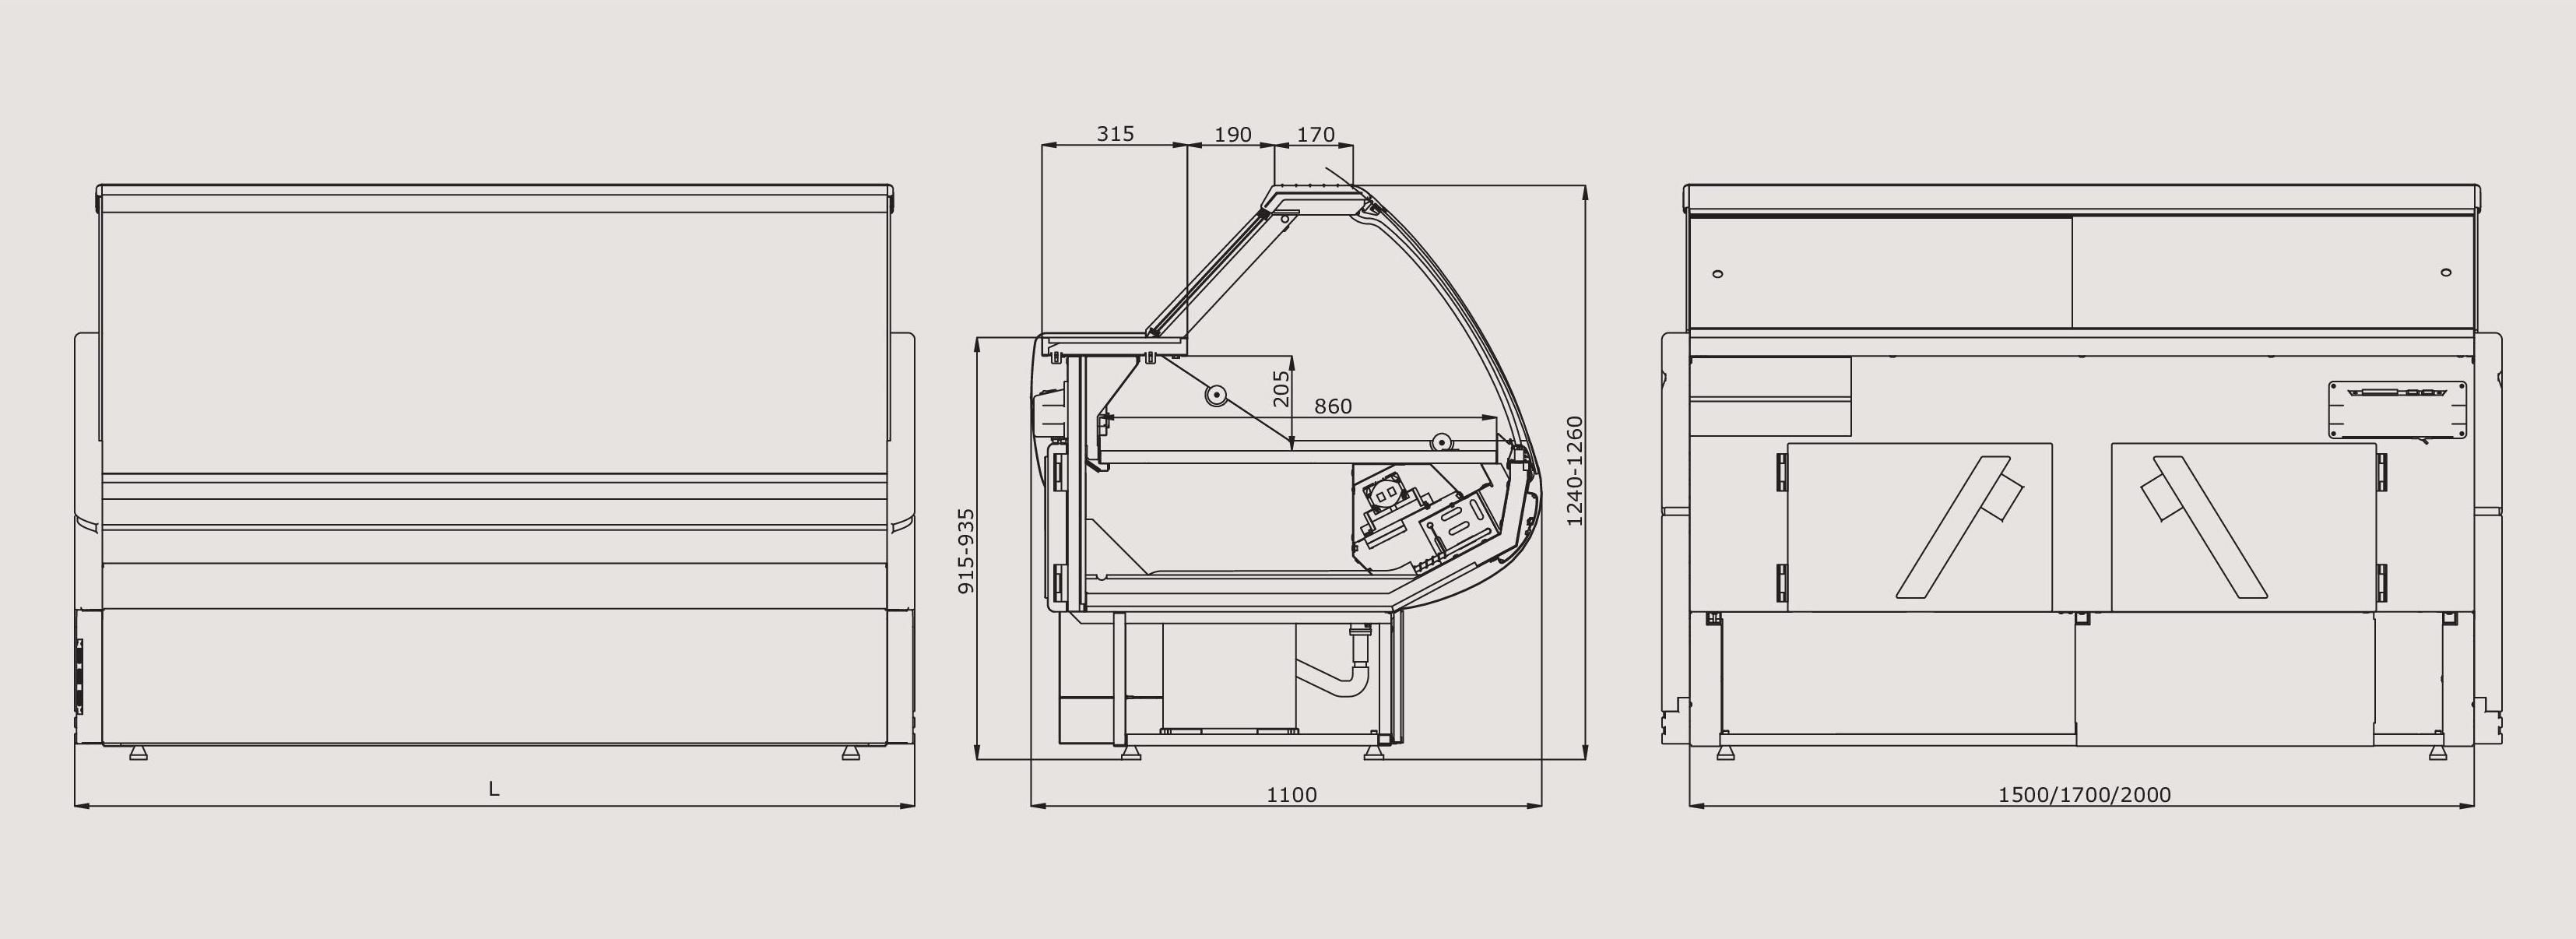 витрины схема холодильника